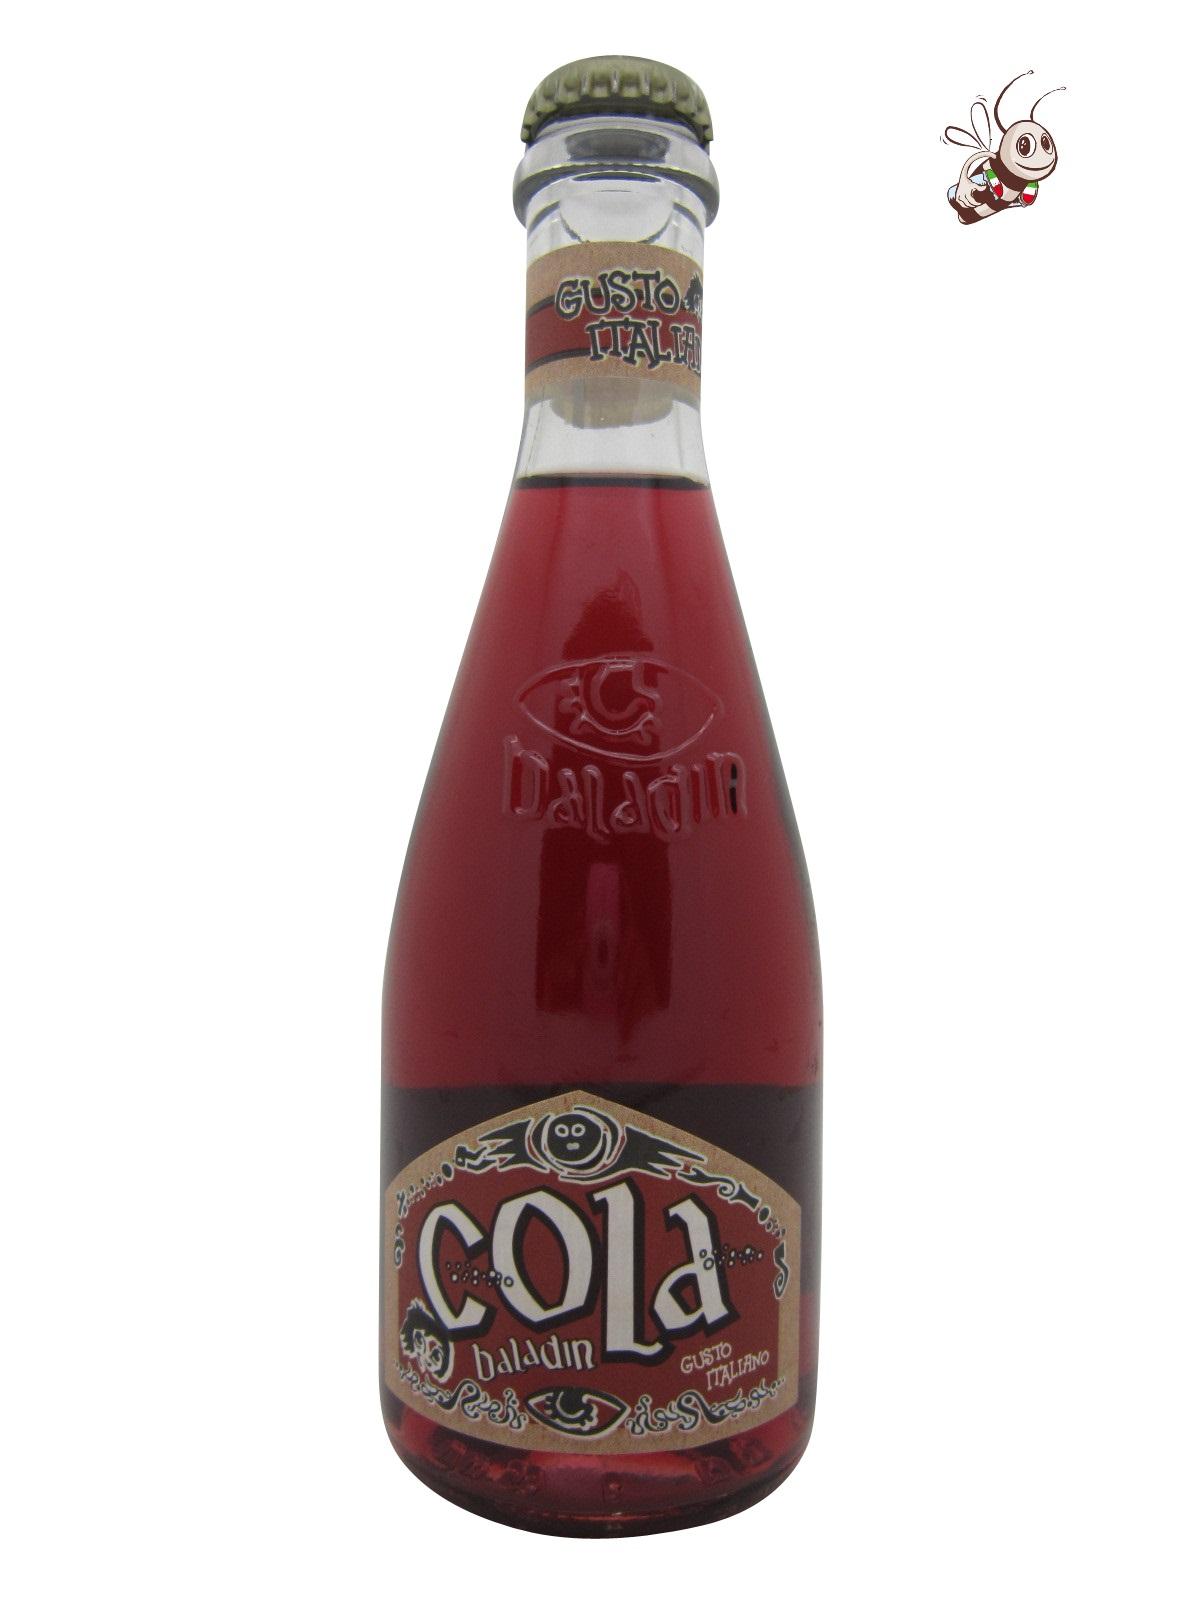 Cola Baladin, artisanl, naturel, slowfood